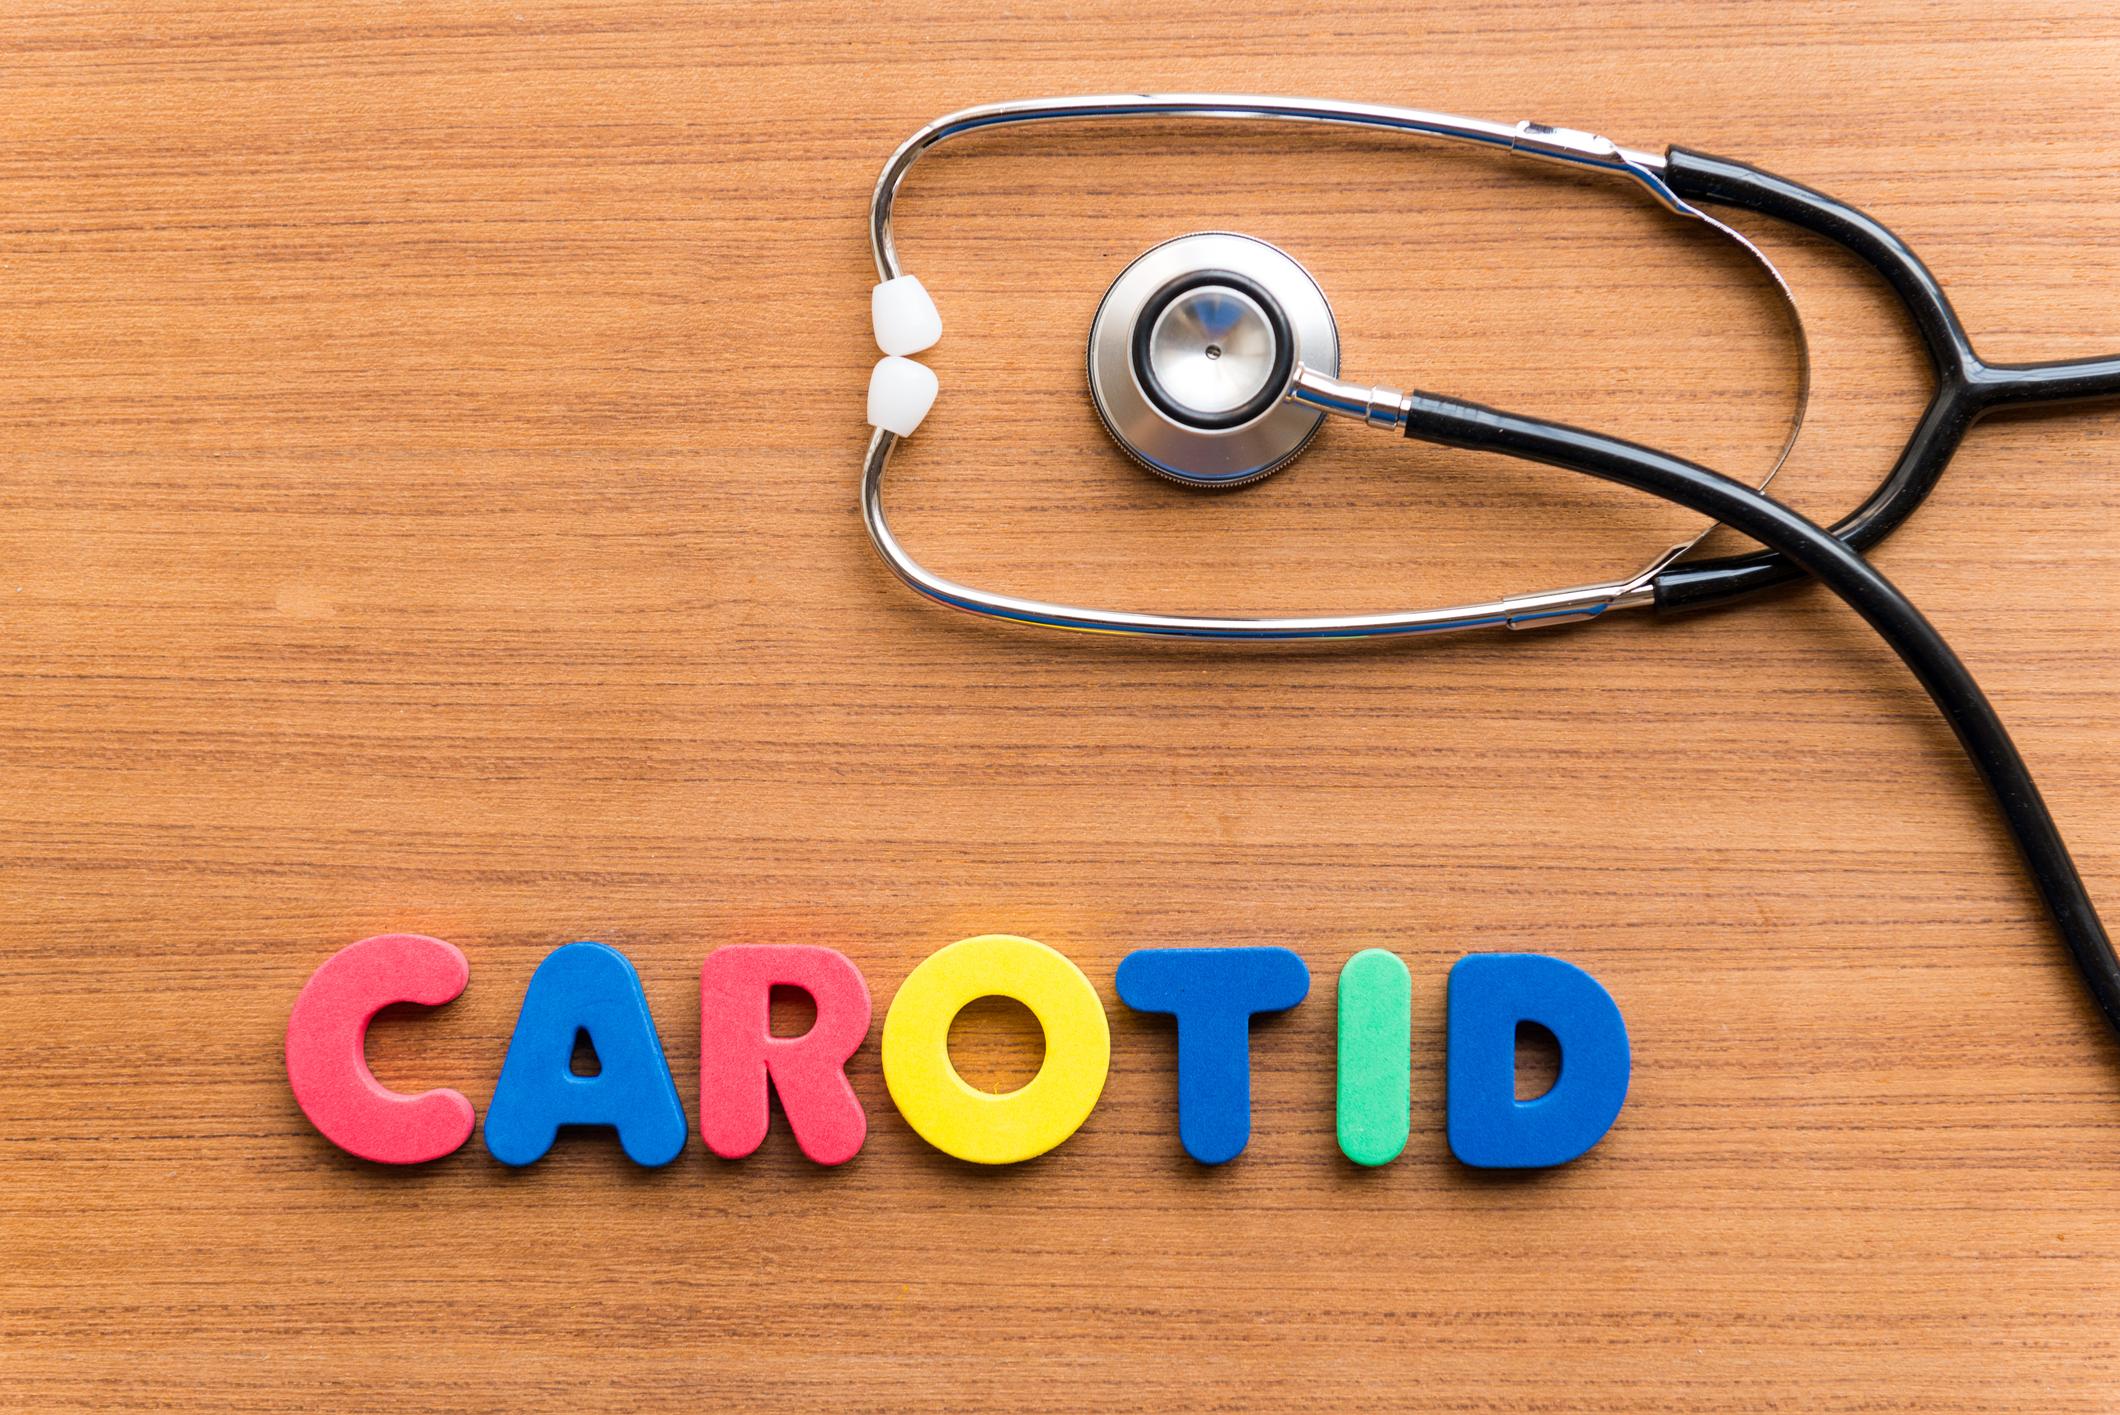 Carotid Artery Disease: Stroke Awareness & Prevention